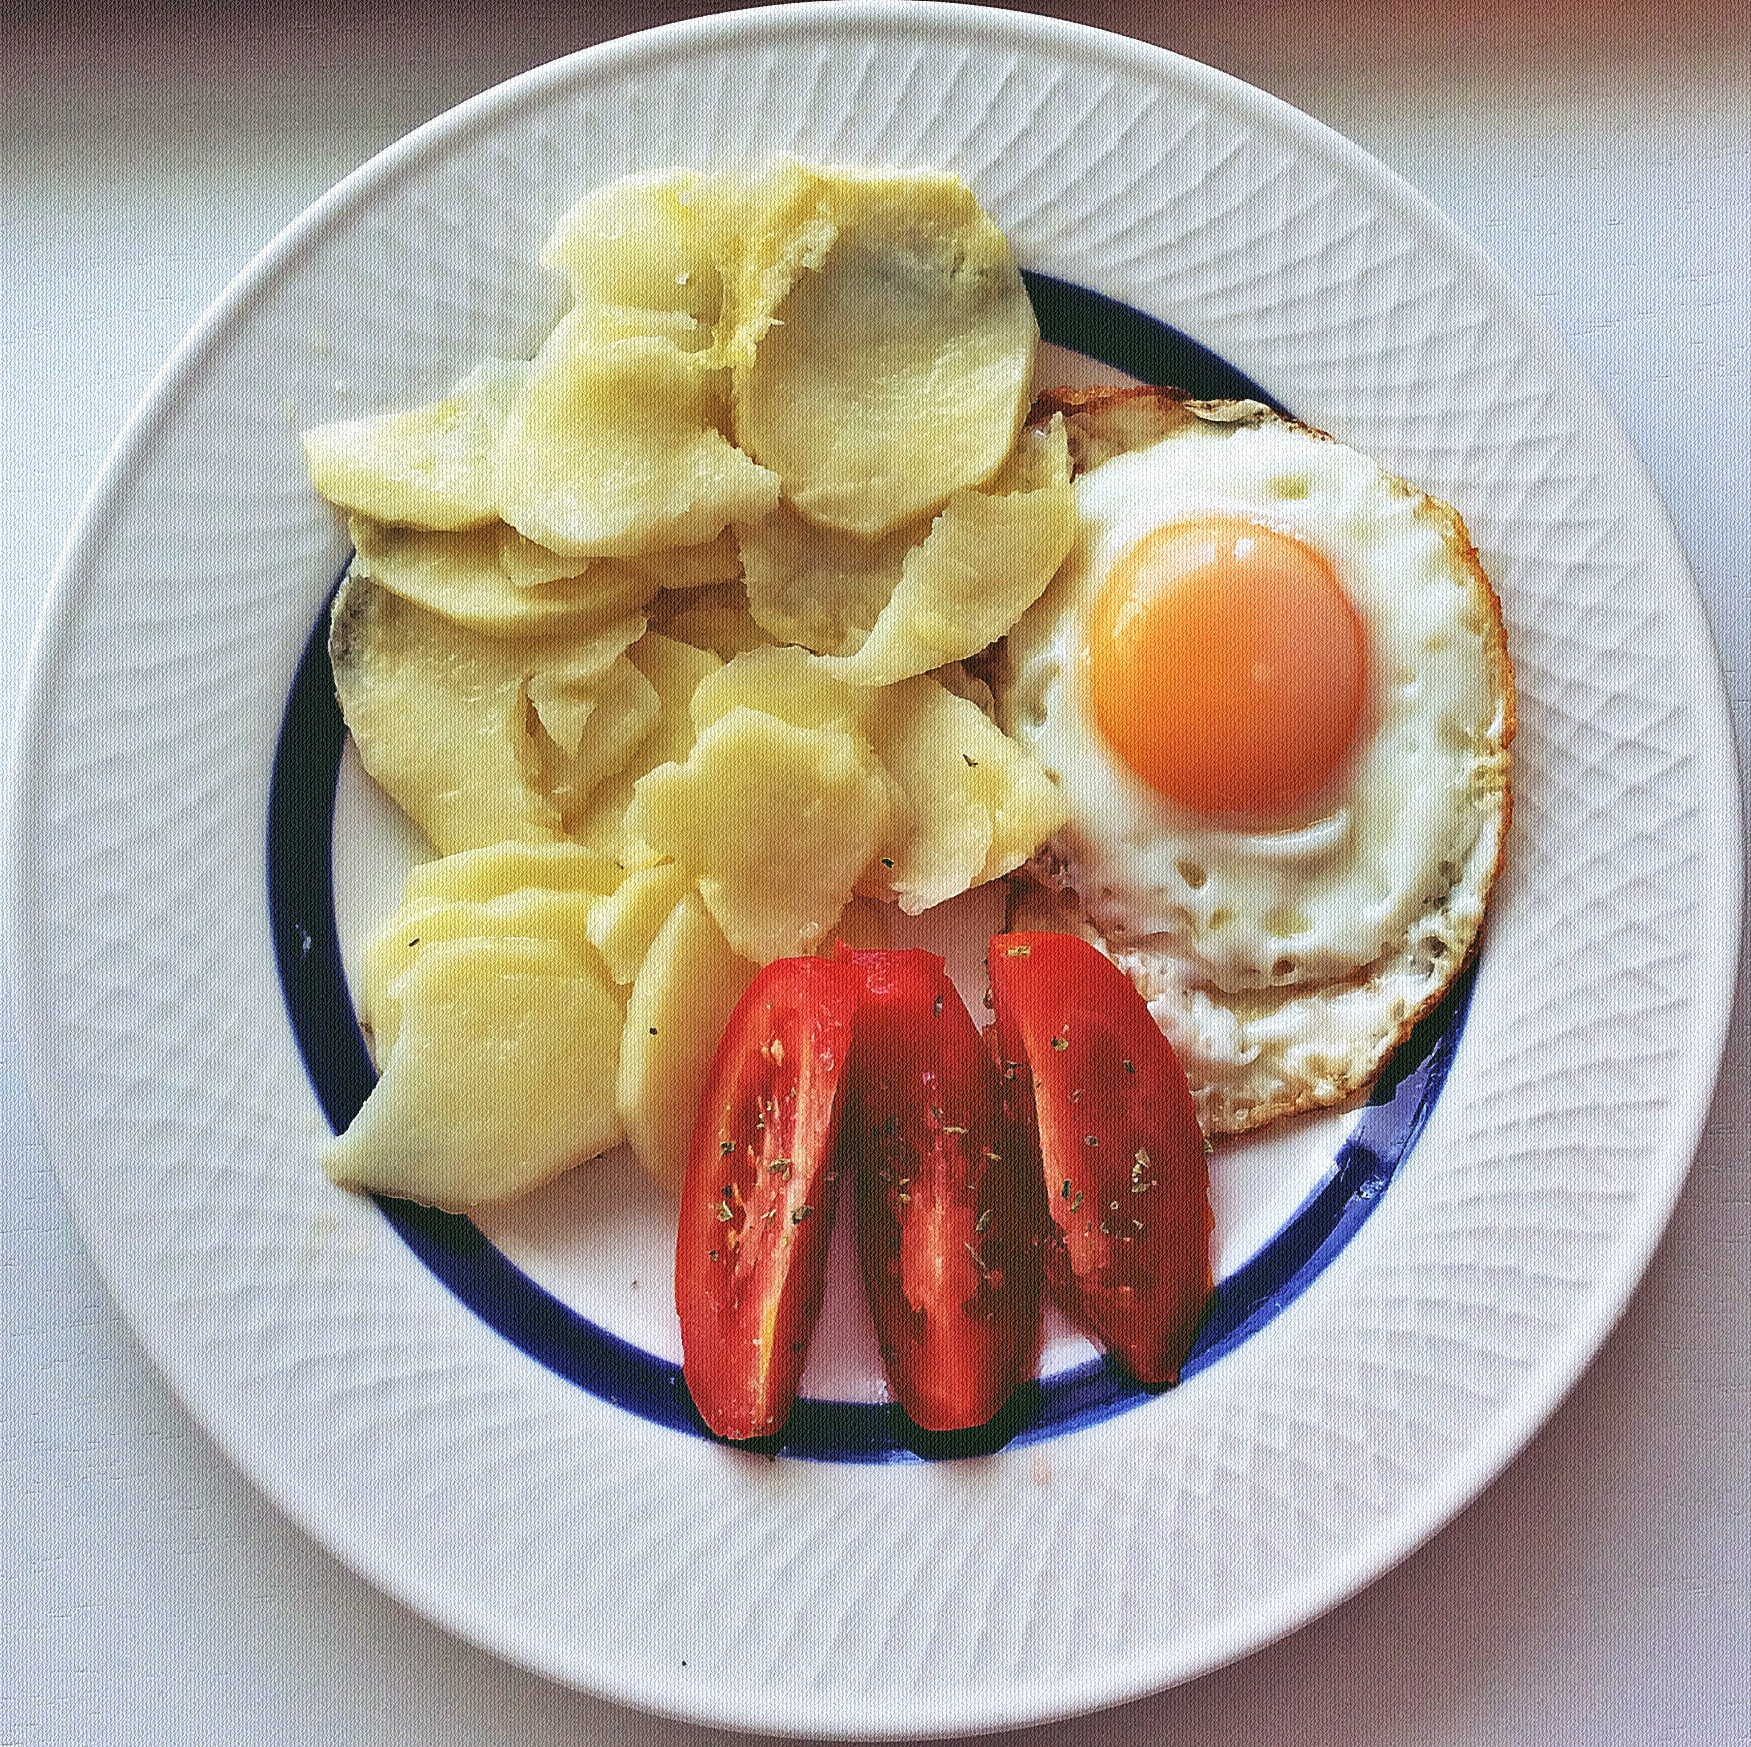 Bonito cocinar con patatas im genes secreto iberico con for Cocinar repollo con patatas